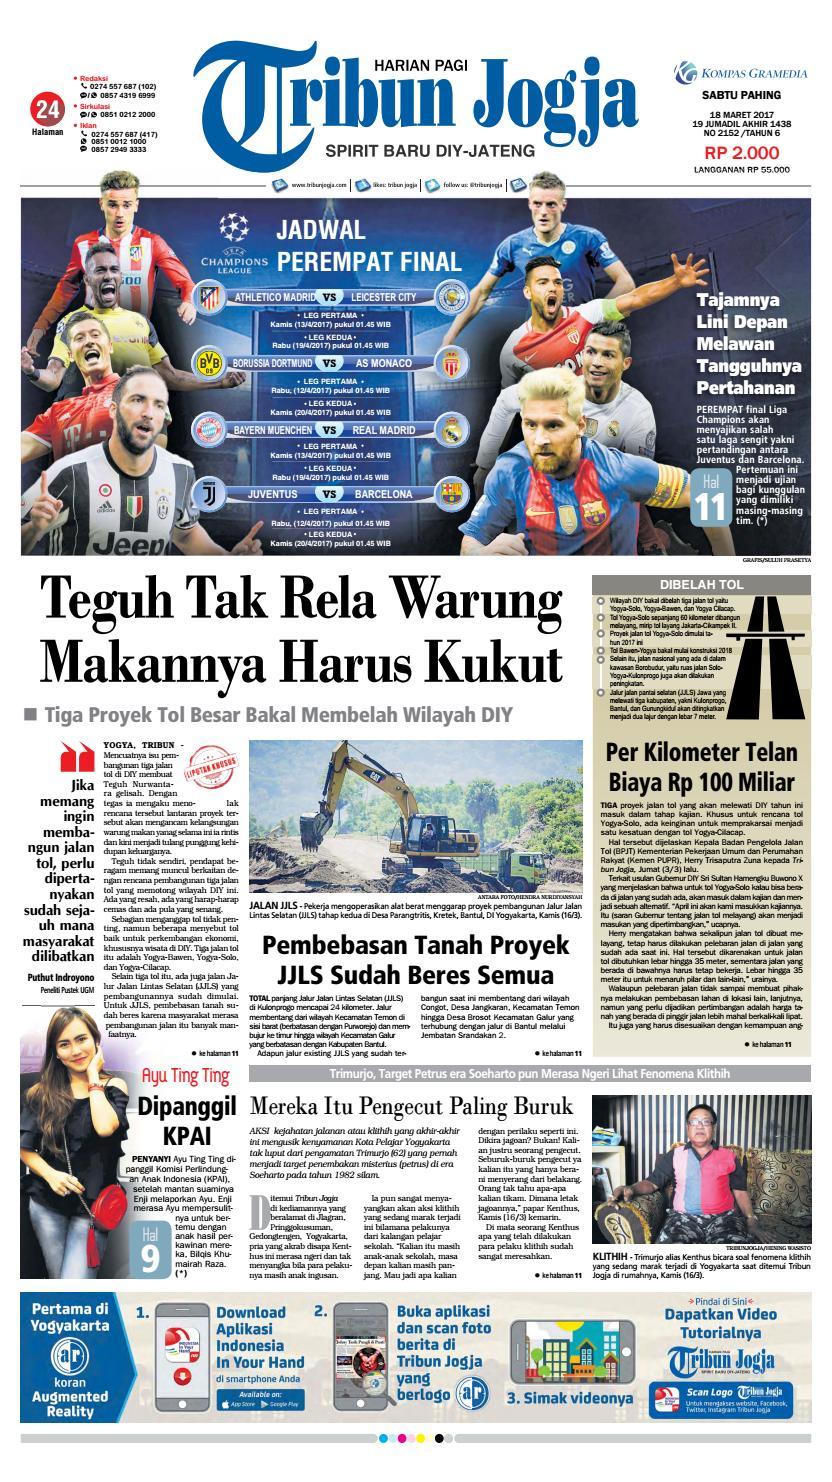 Tribunjogja 18-03-2017 by tribun jogja - issuu